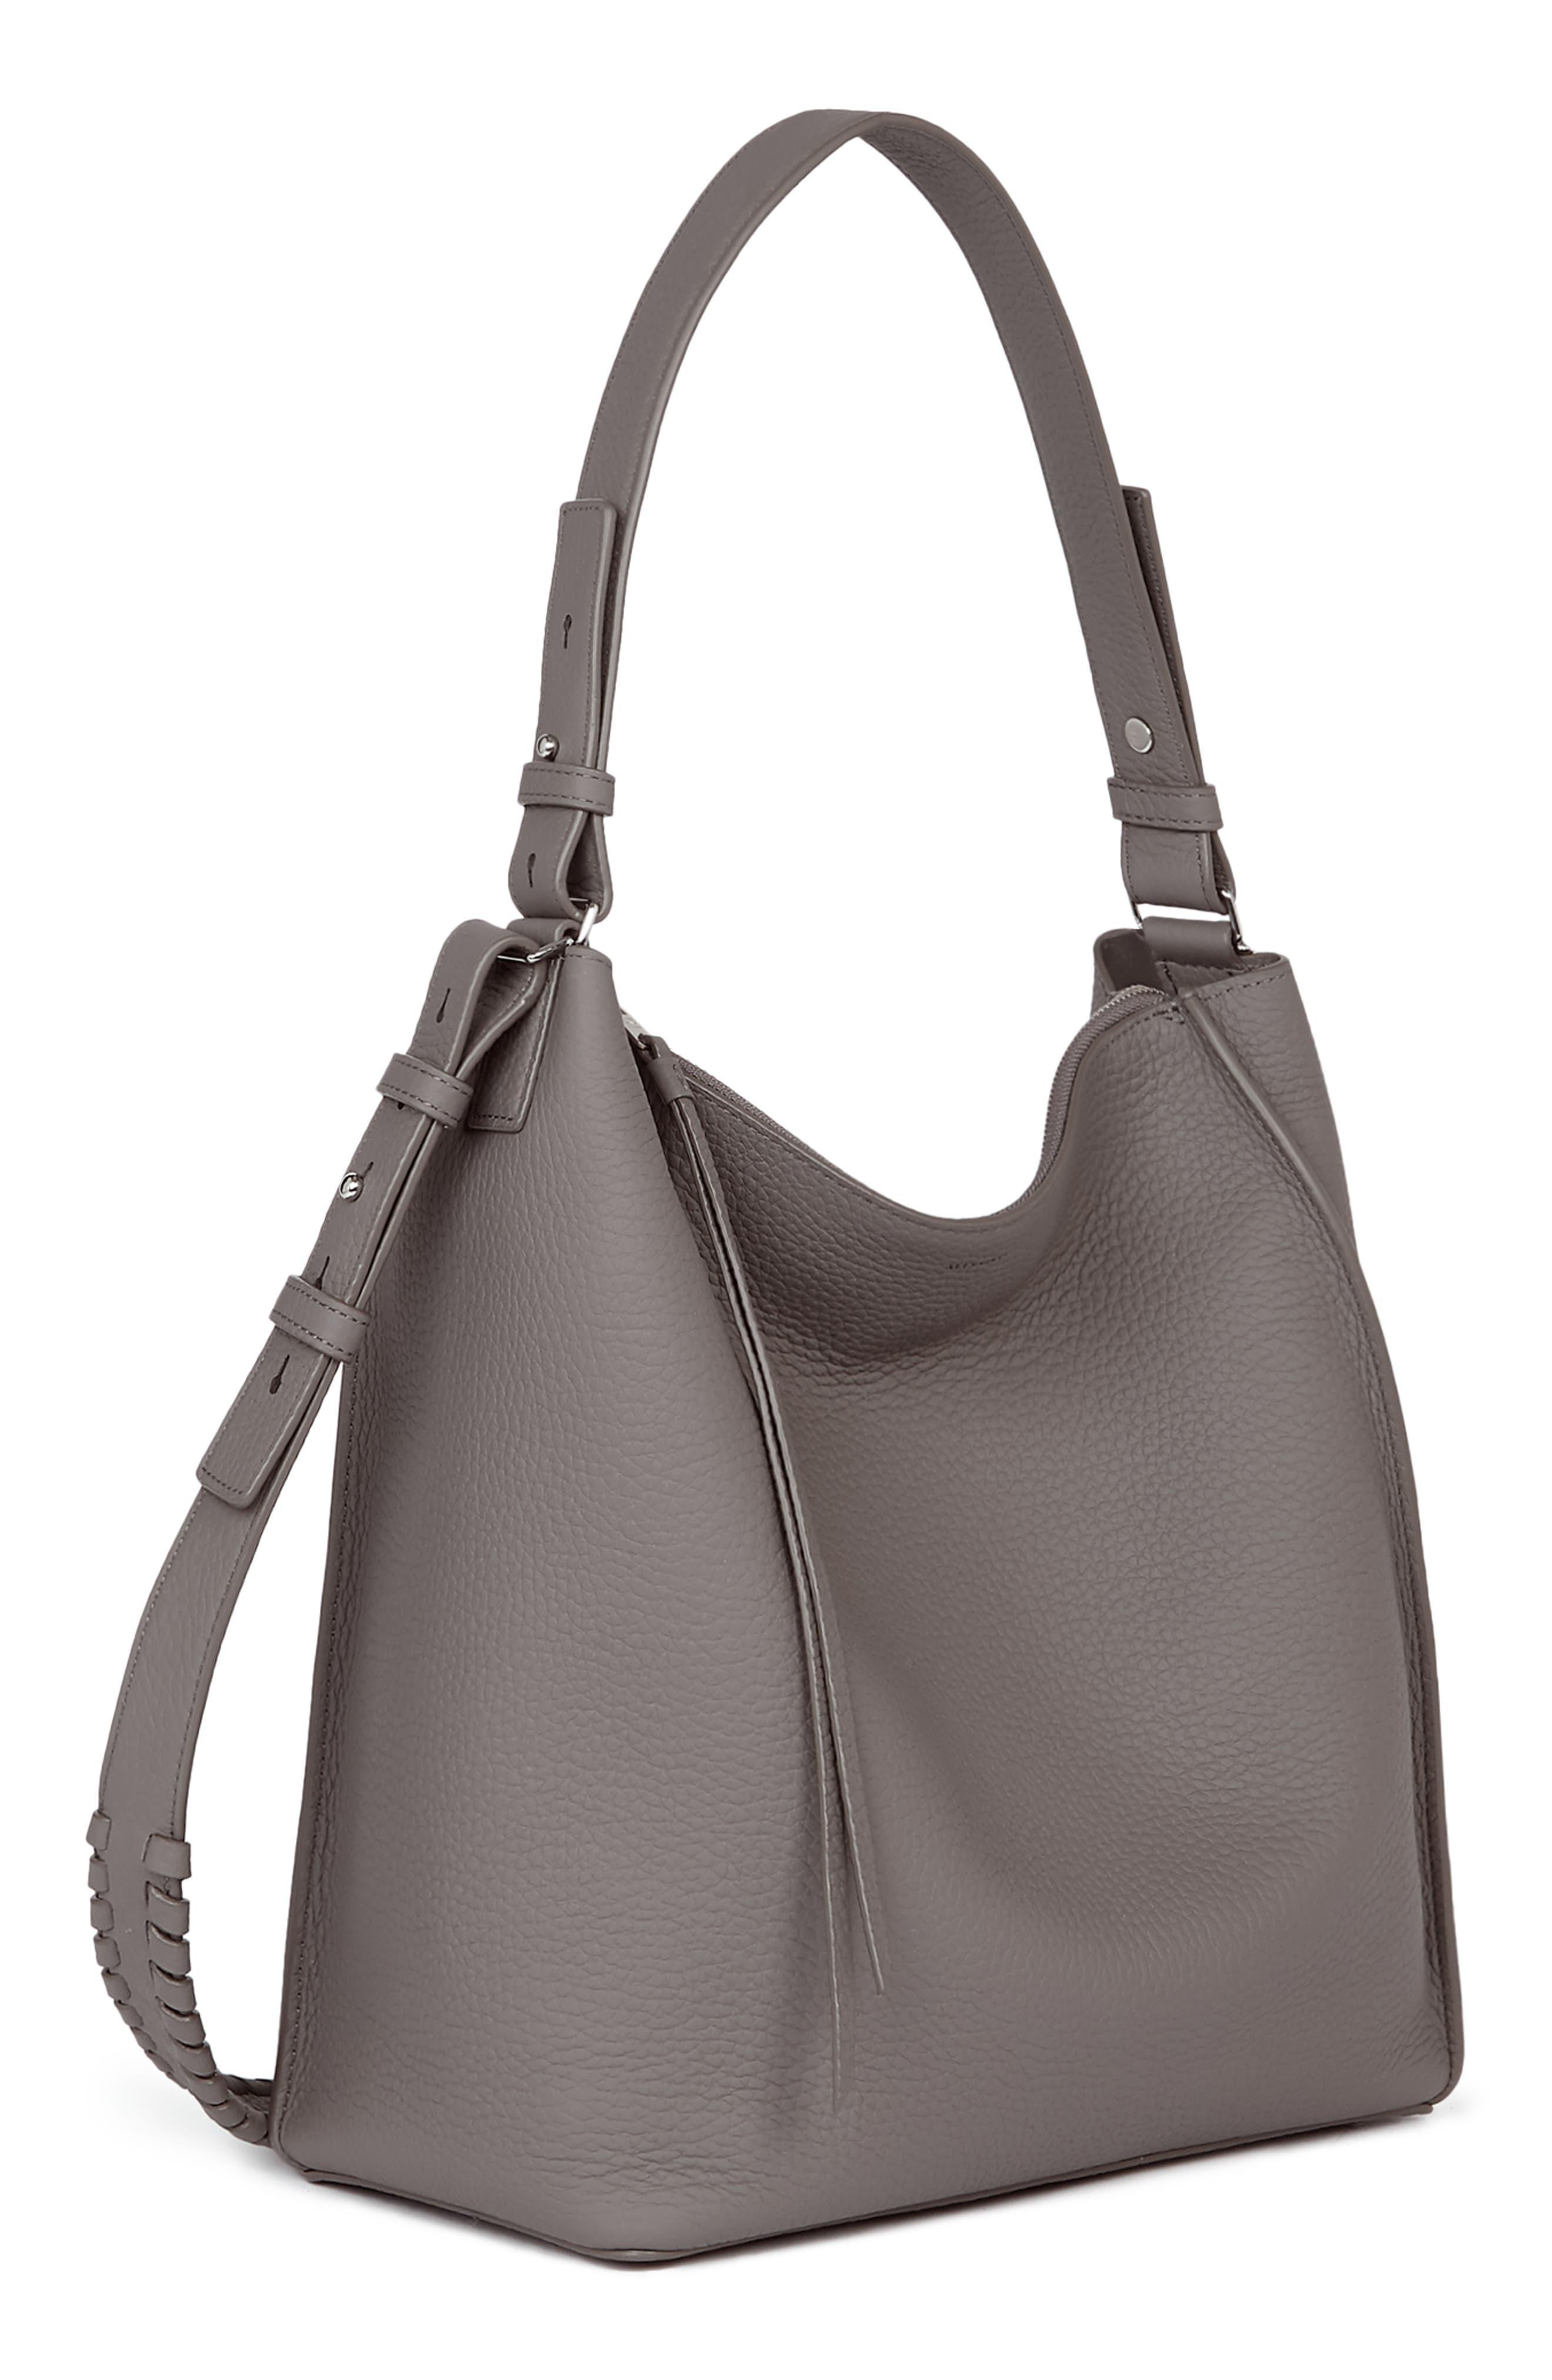 'Kita' Leather Shoulder/Crossbody Bag,                             Alternate thumbnail 5, color,                             STORM GREY